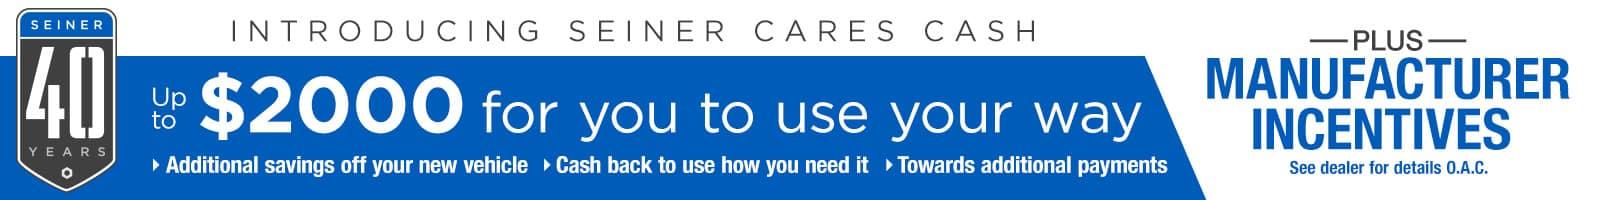 Jerry Seiner Cares Cash